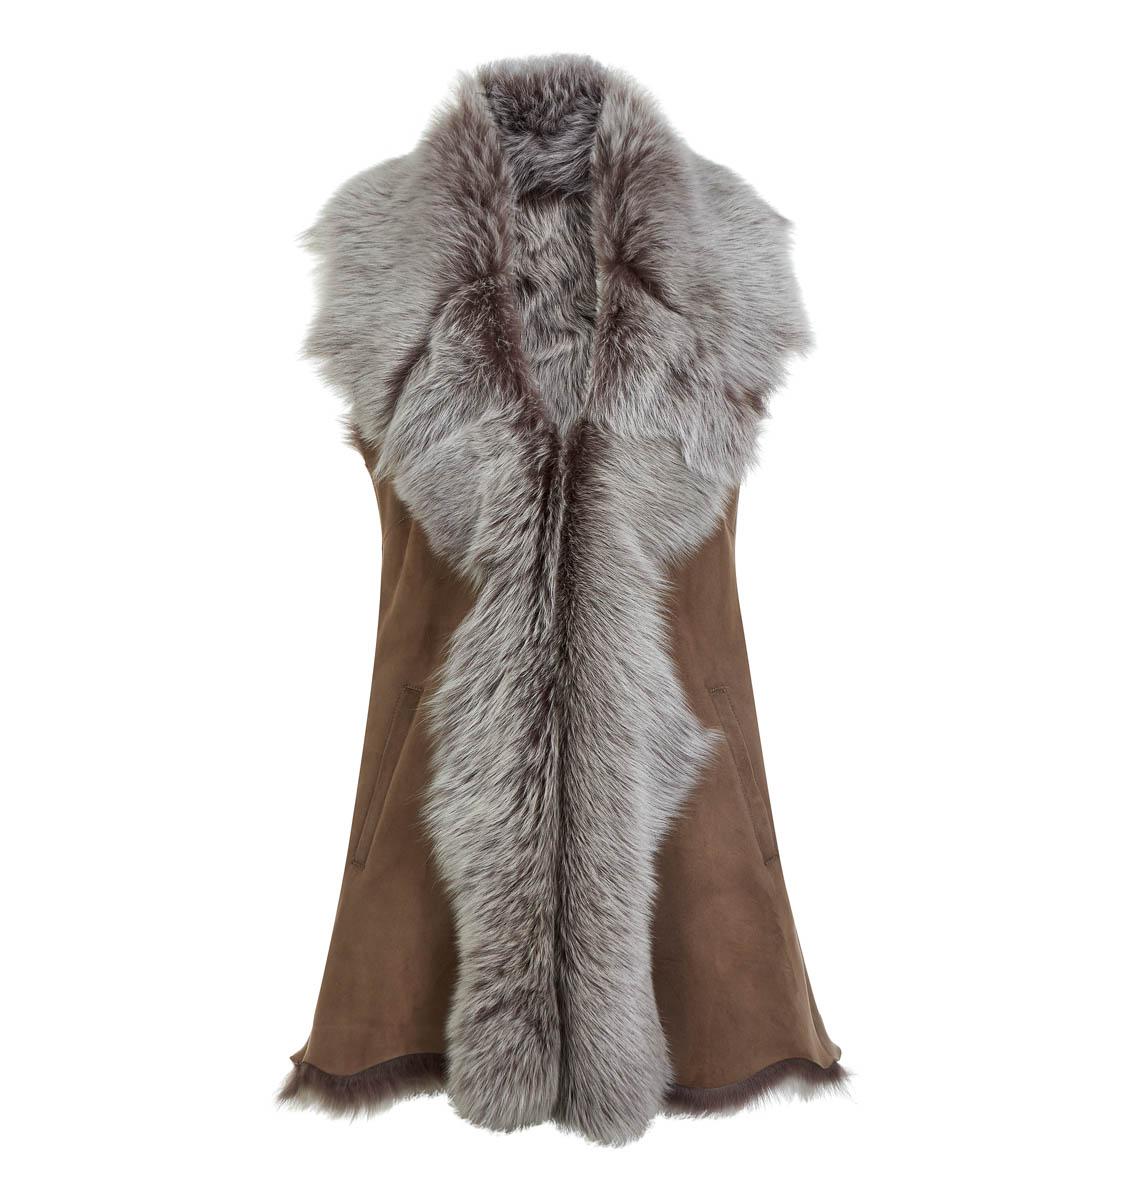 Leather Classics taupe long sheepskin gilet